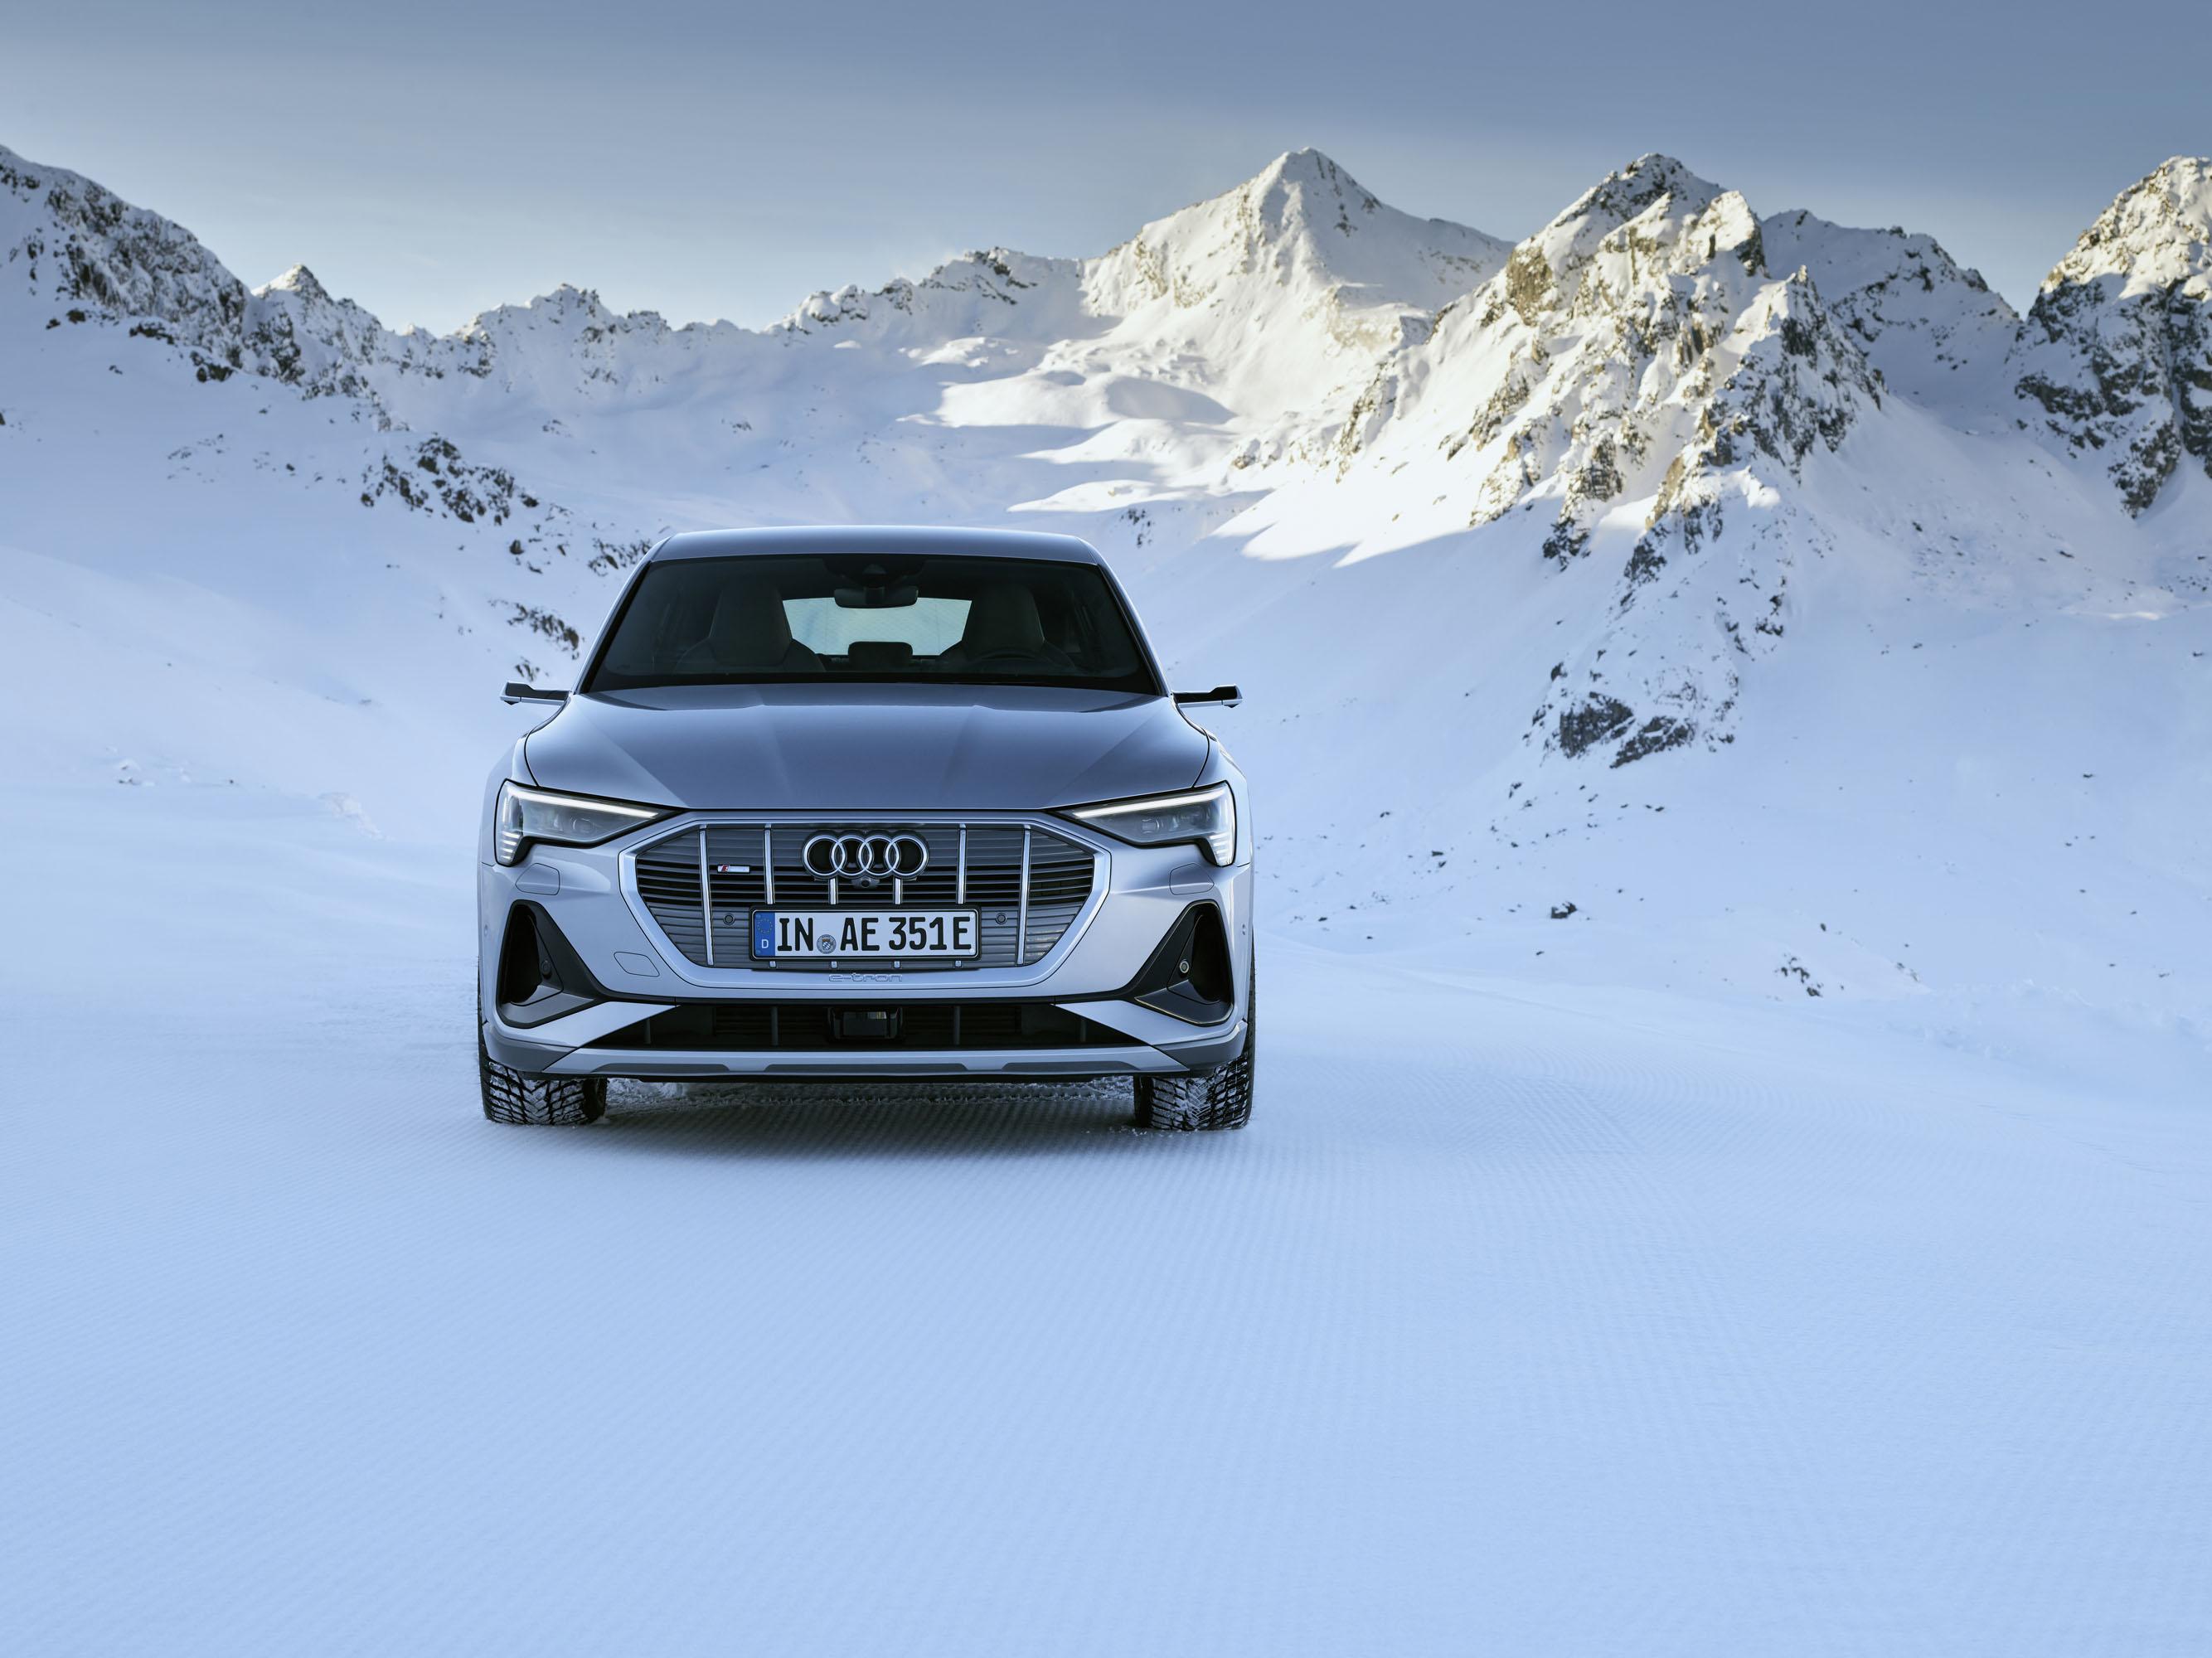 Audi e-tron Sportback photo #1